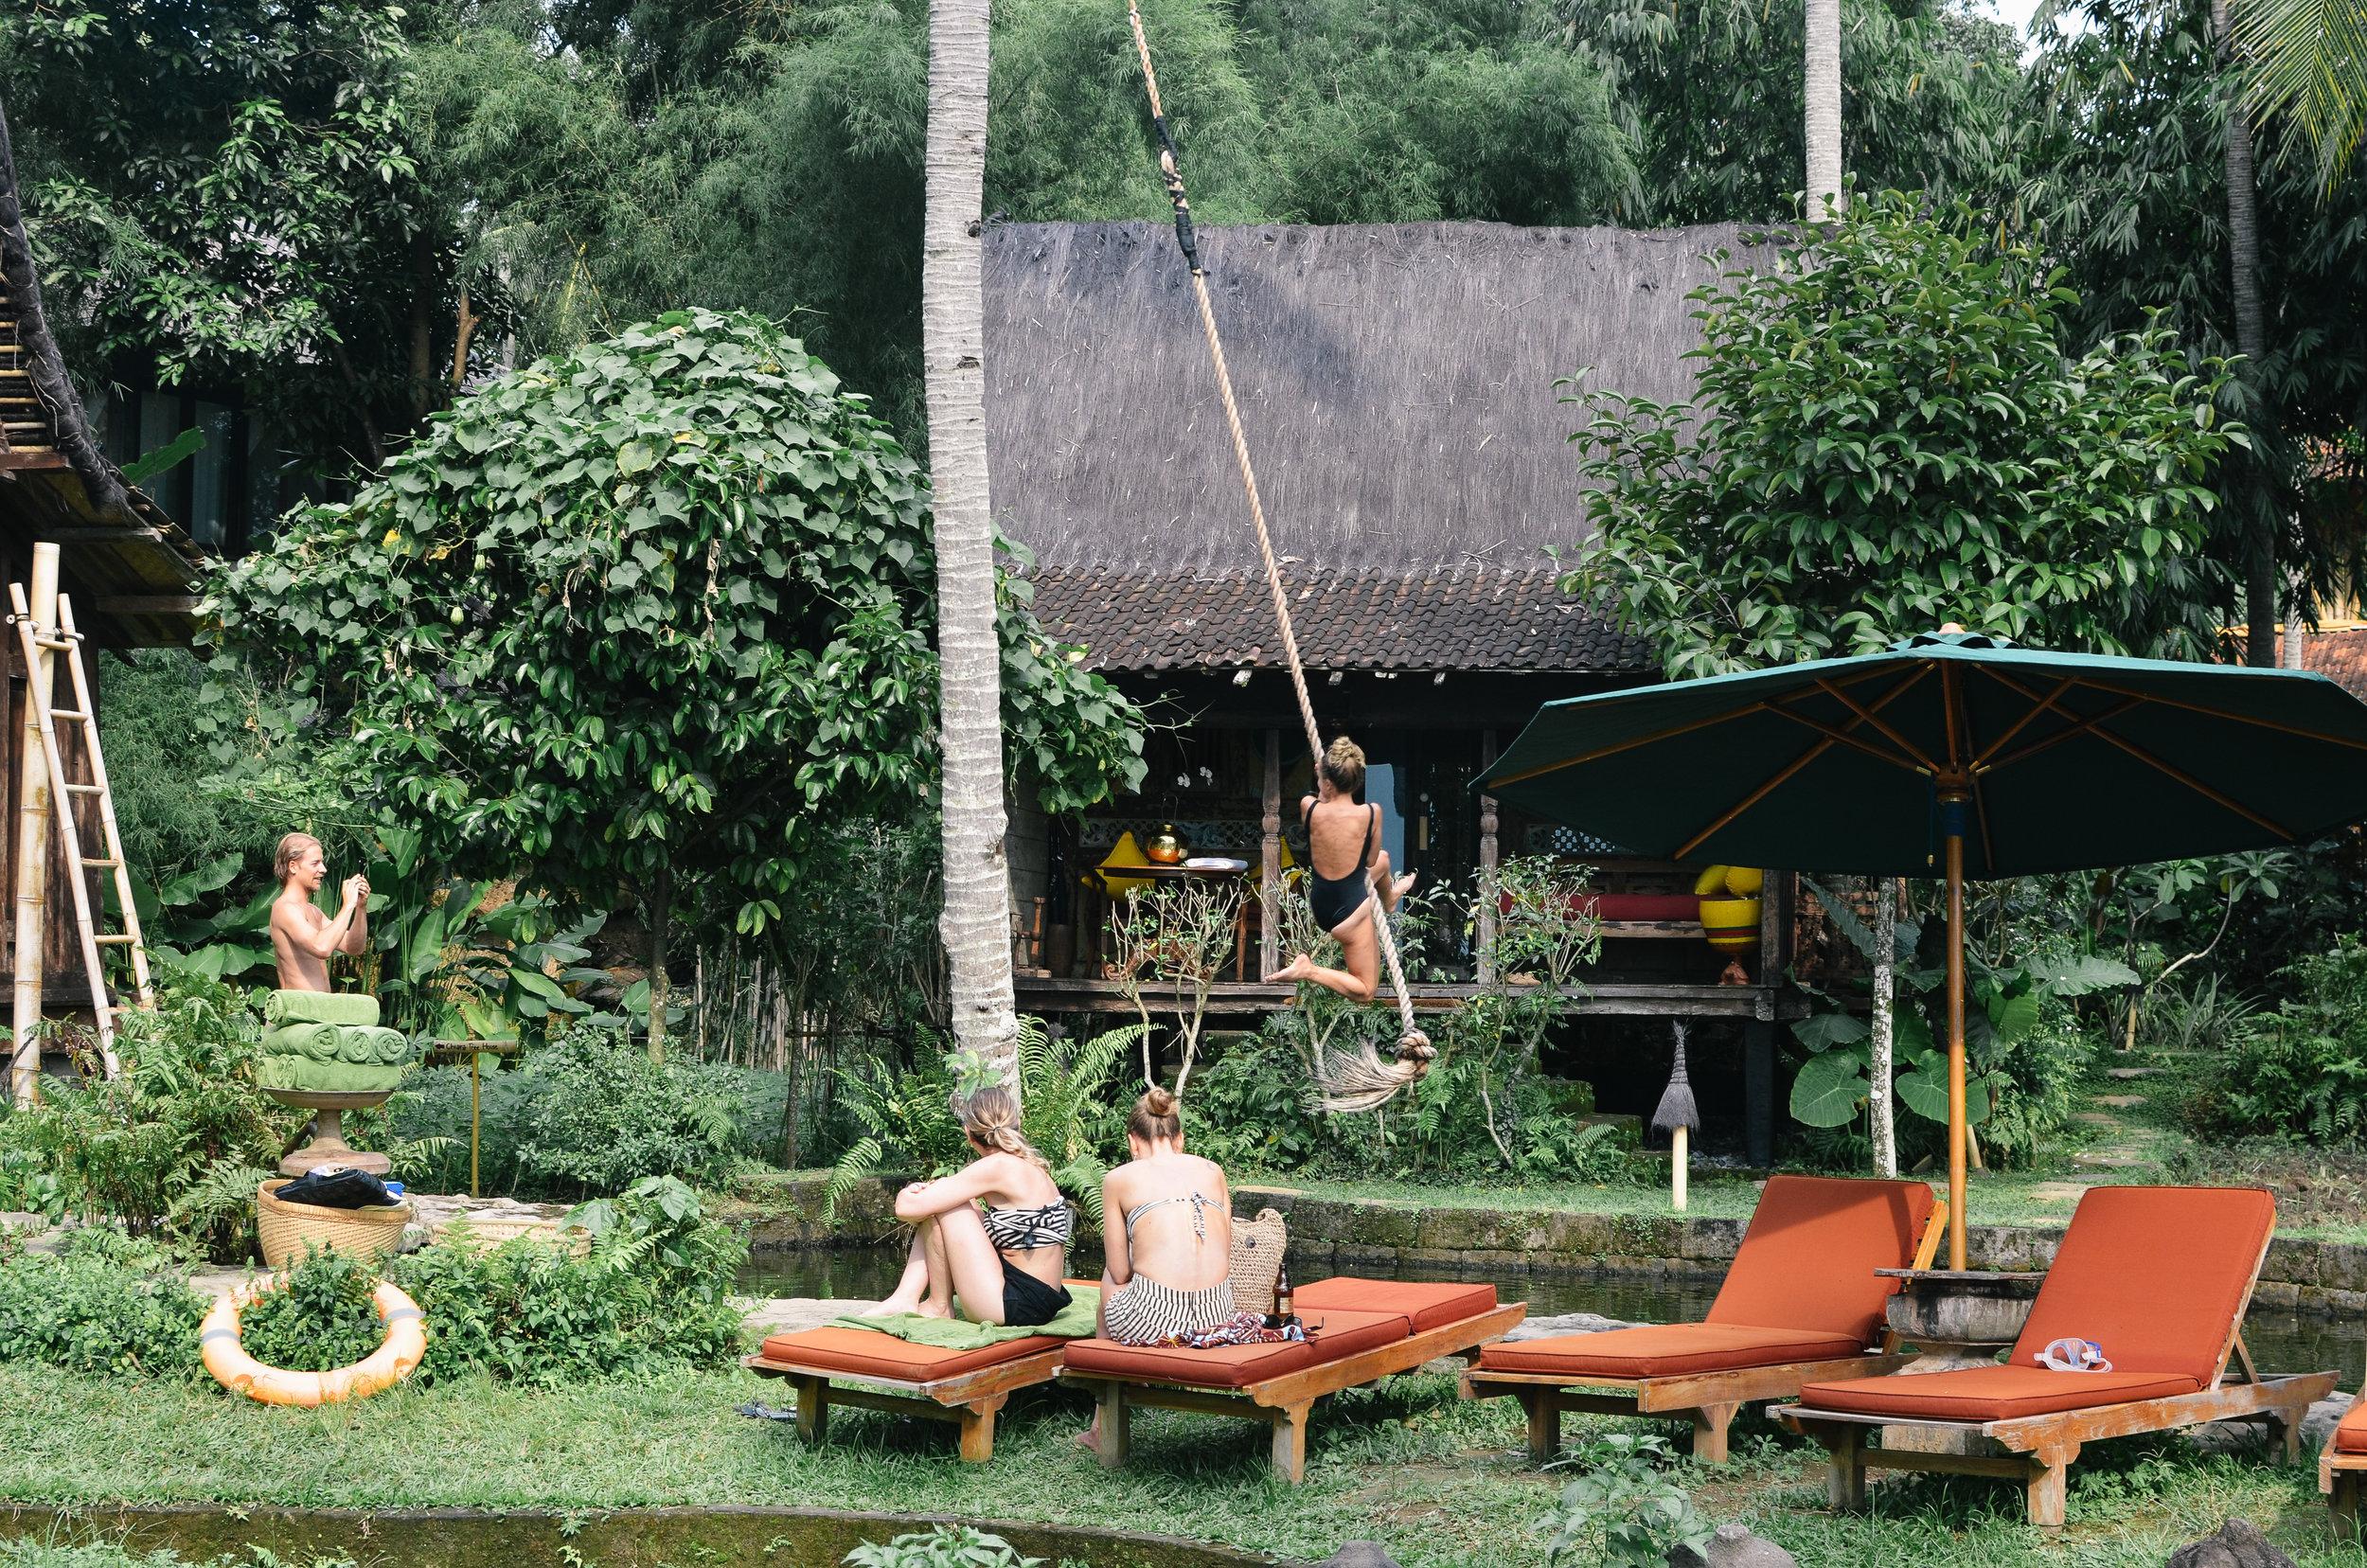 bali+mosca+bamboo+lodge+bali+ubud+lifeonpine_DSC_2863.jpg